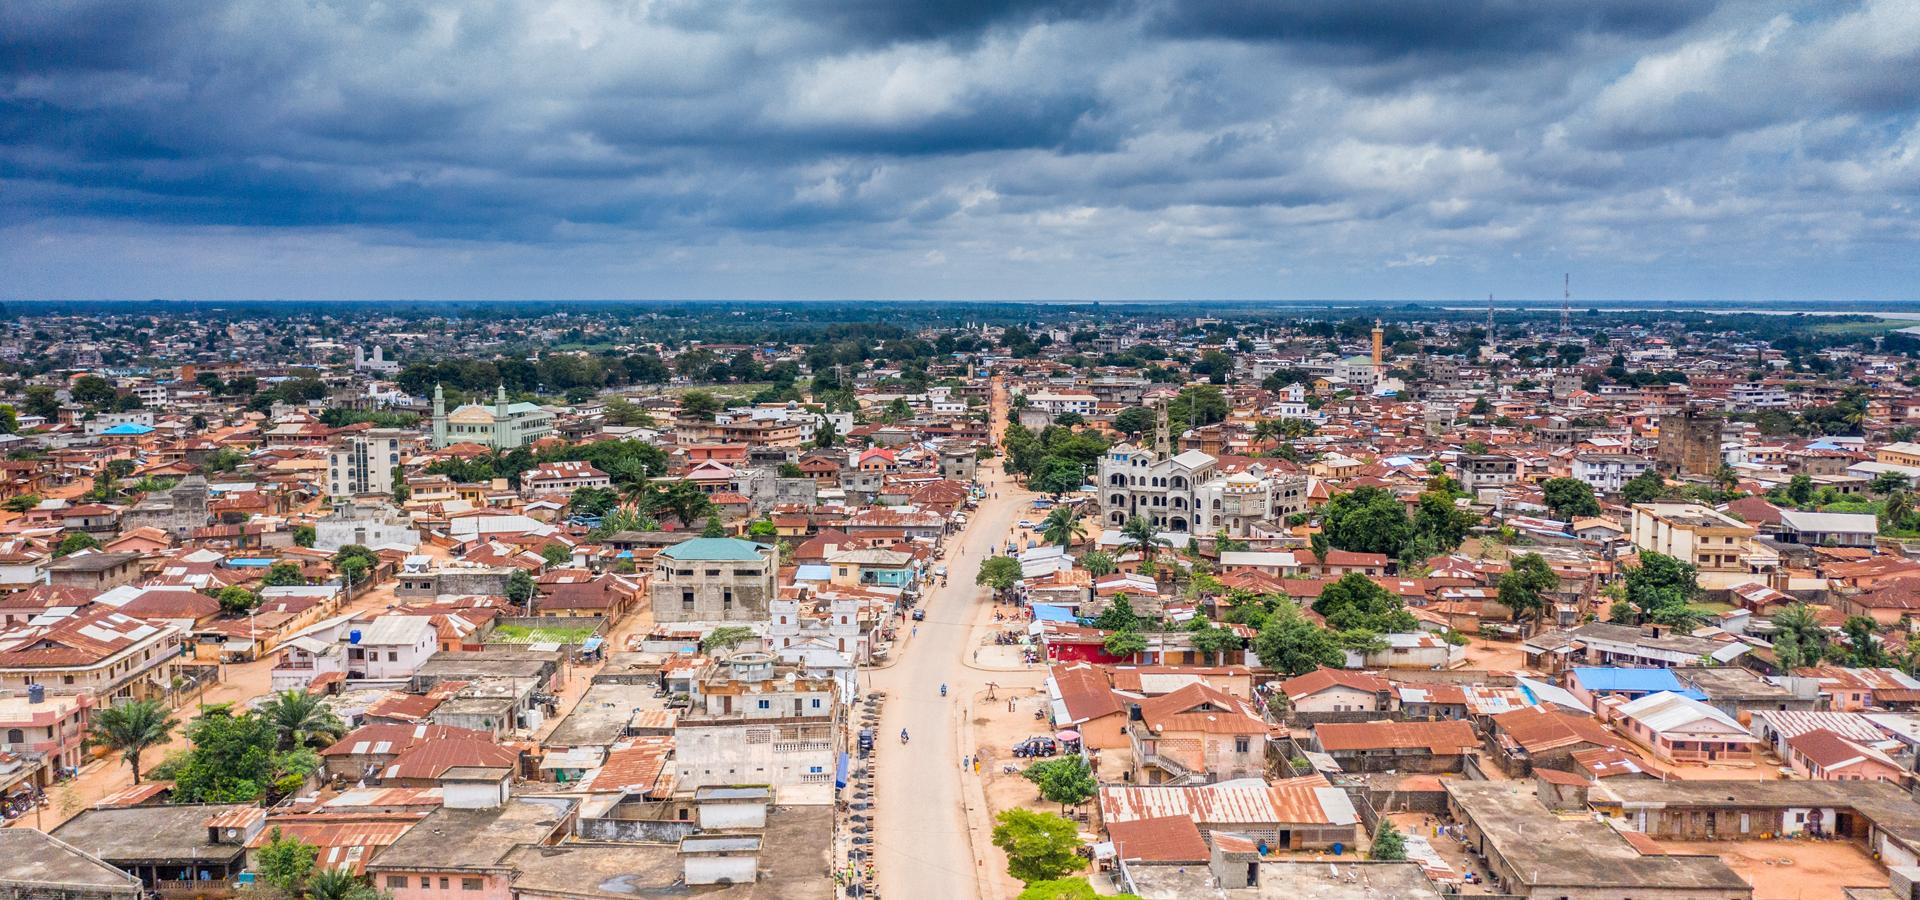 Peer-to-peer advisory in Benin City, Edo State, Nigeria